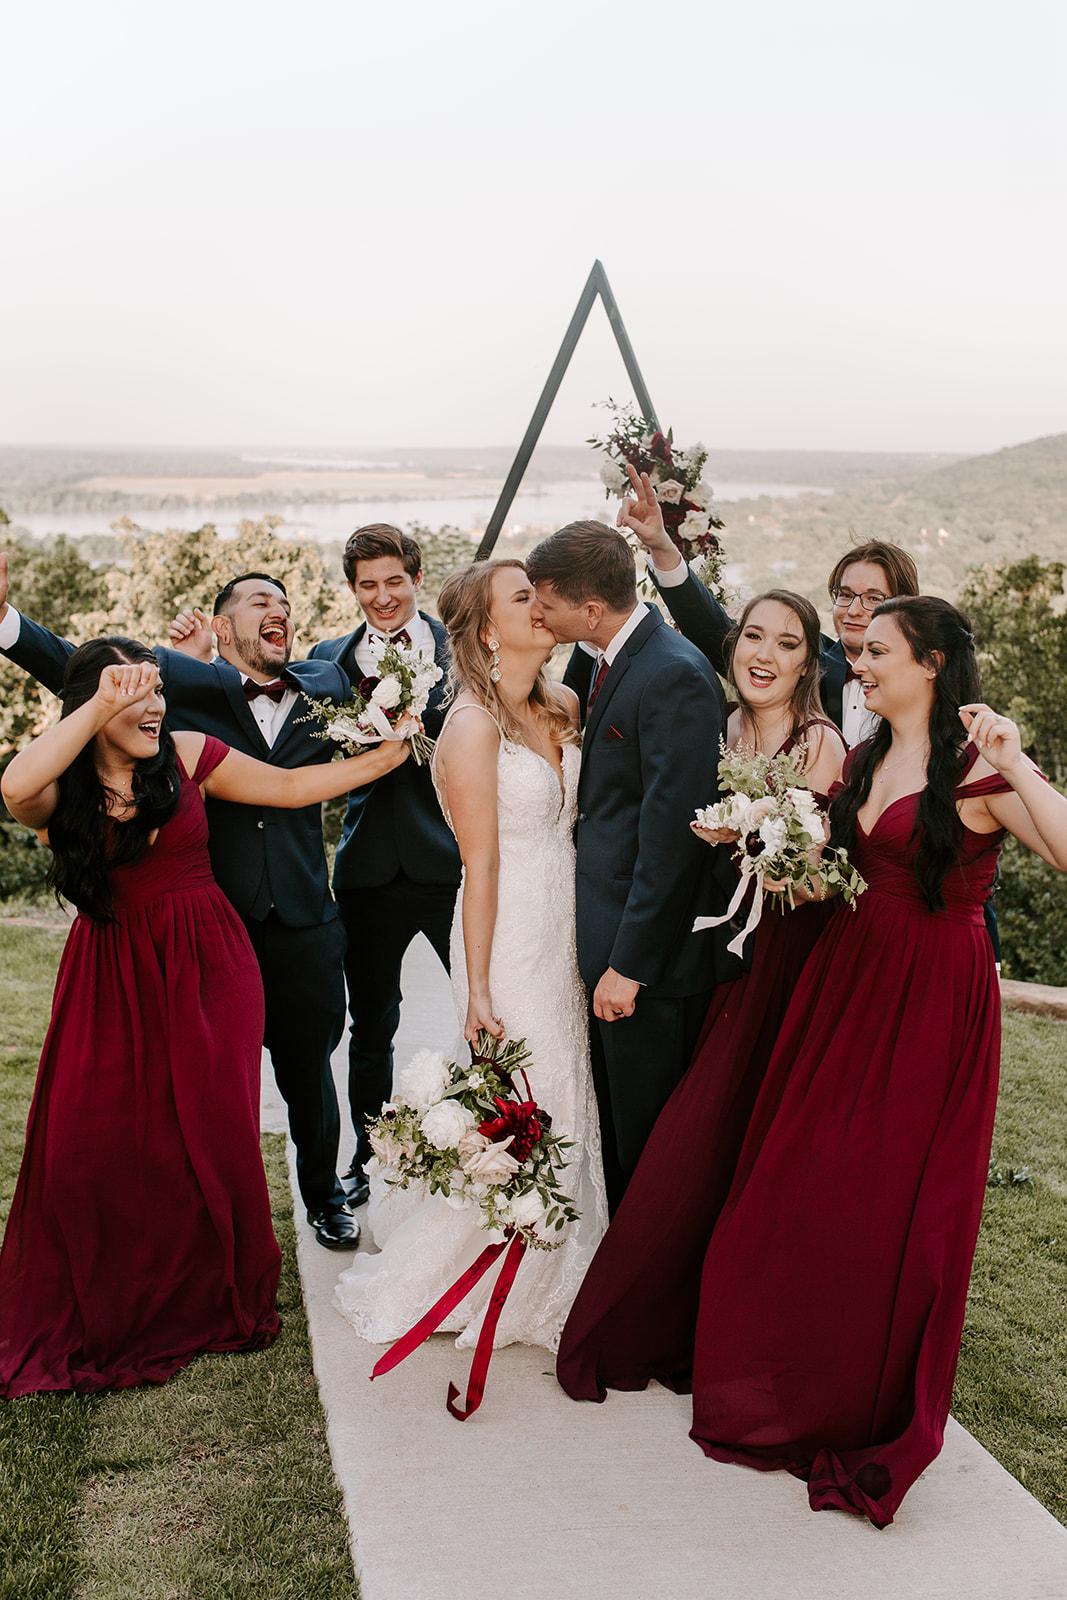 Wedding Venues in Tulsa white barn Dream Point Ranch 29.jpg